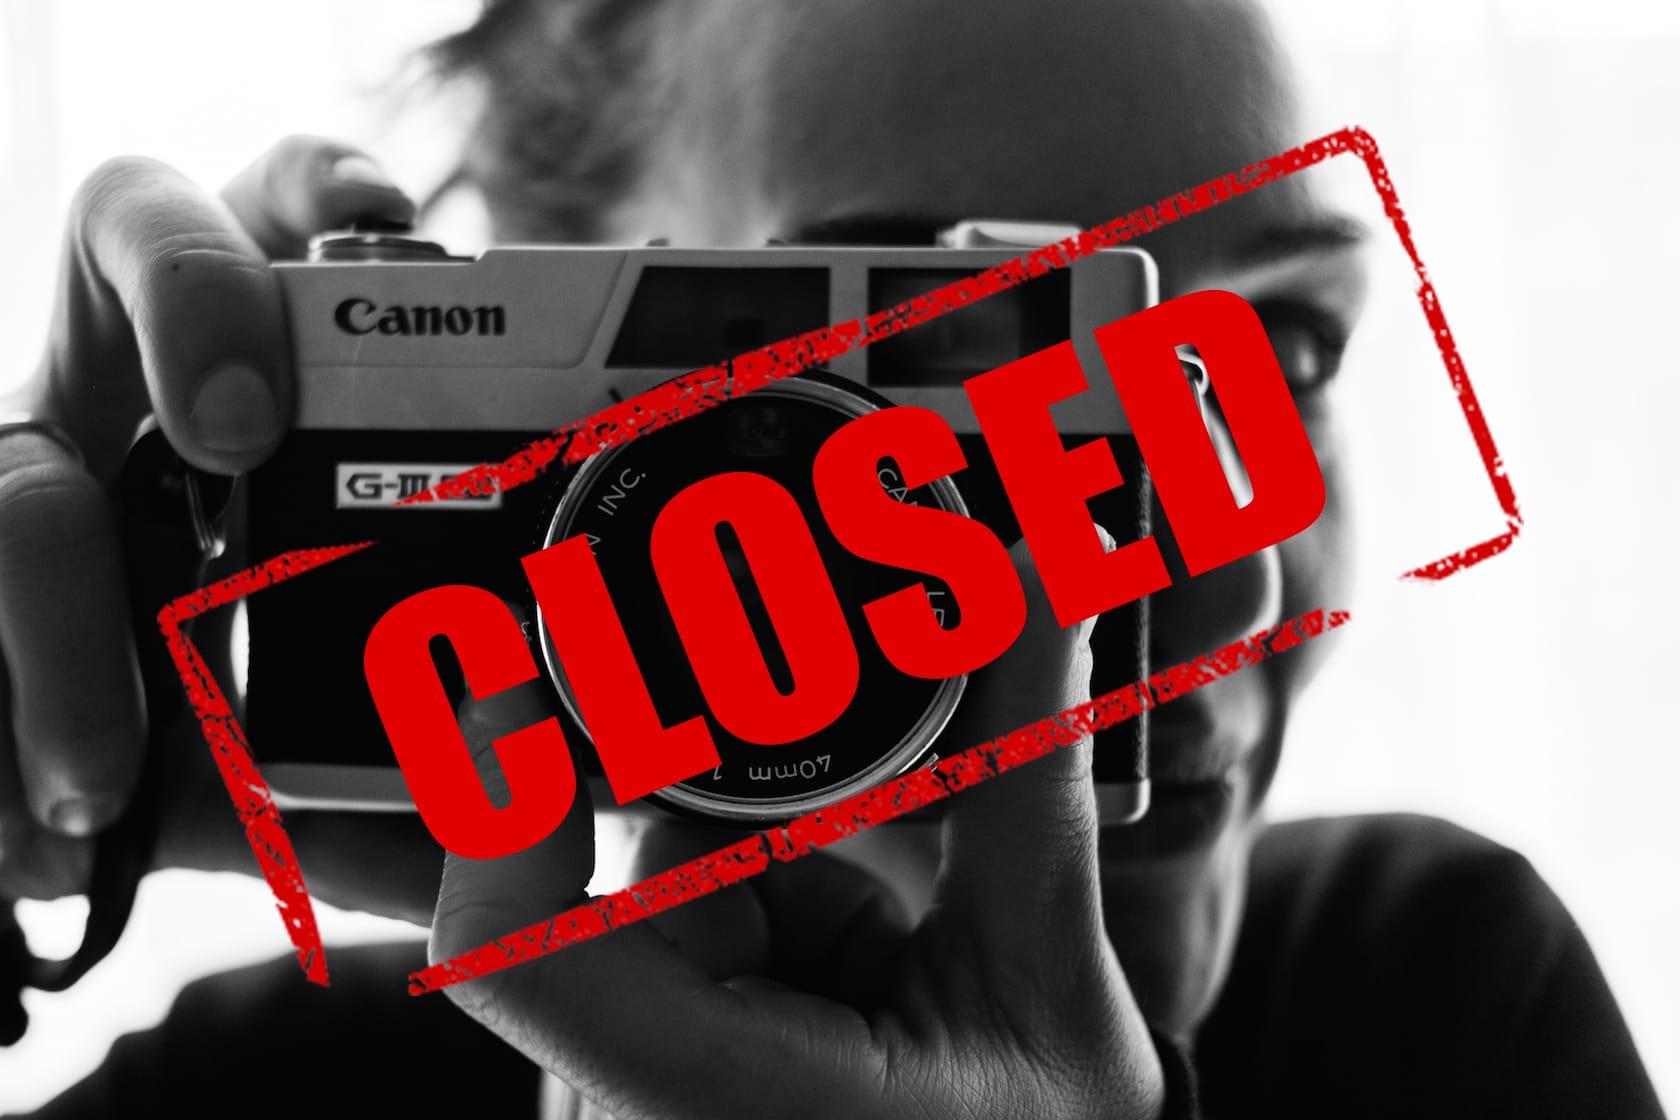 Debrief-20-favs-street-poll-closed